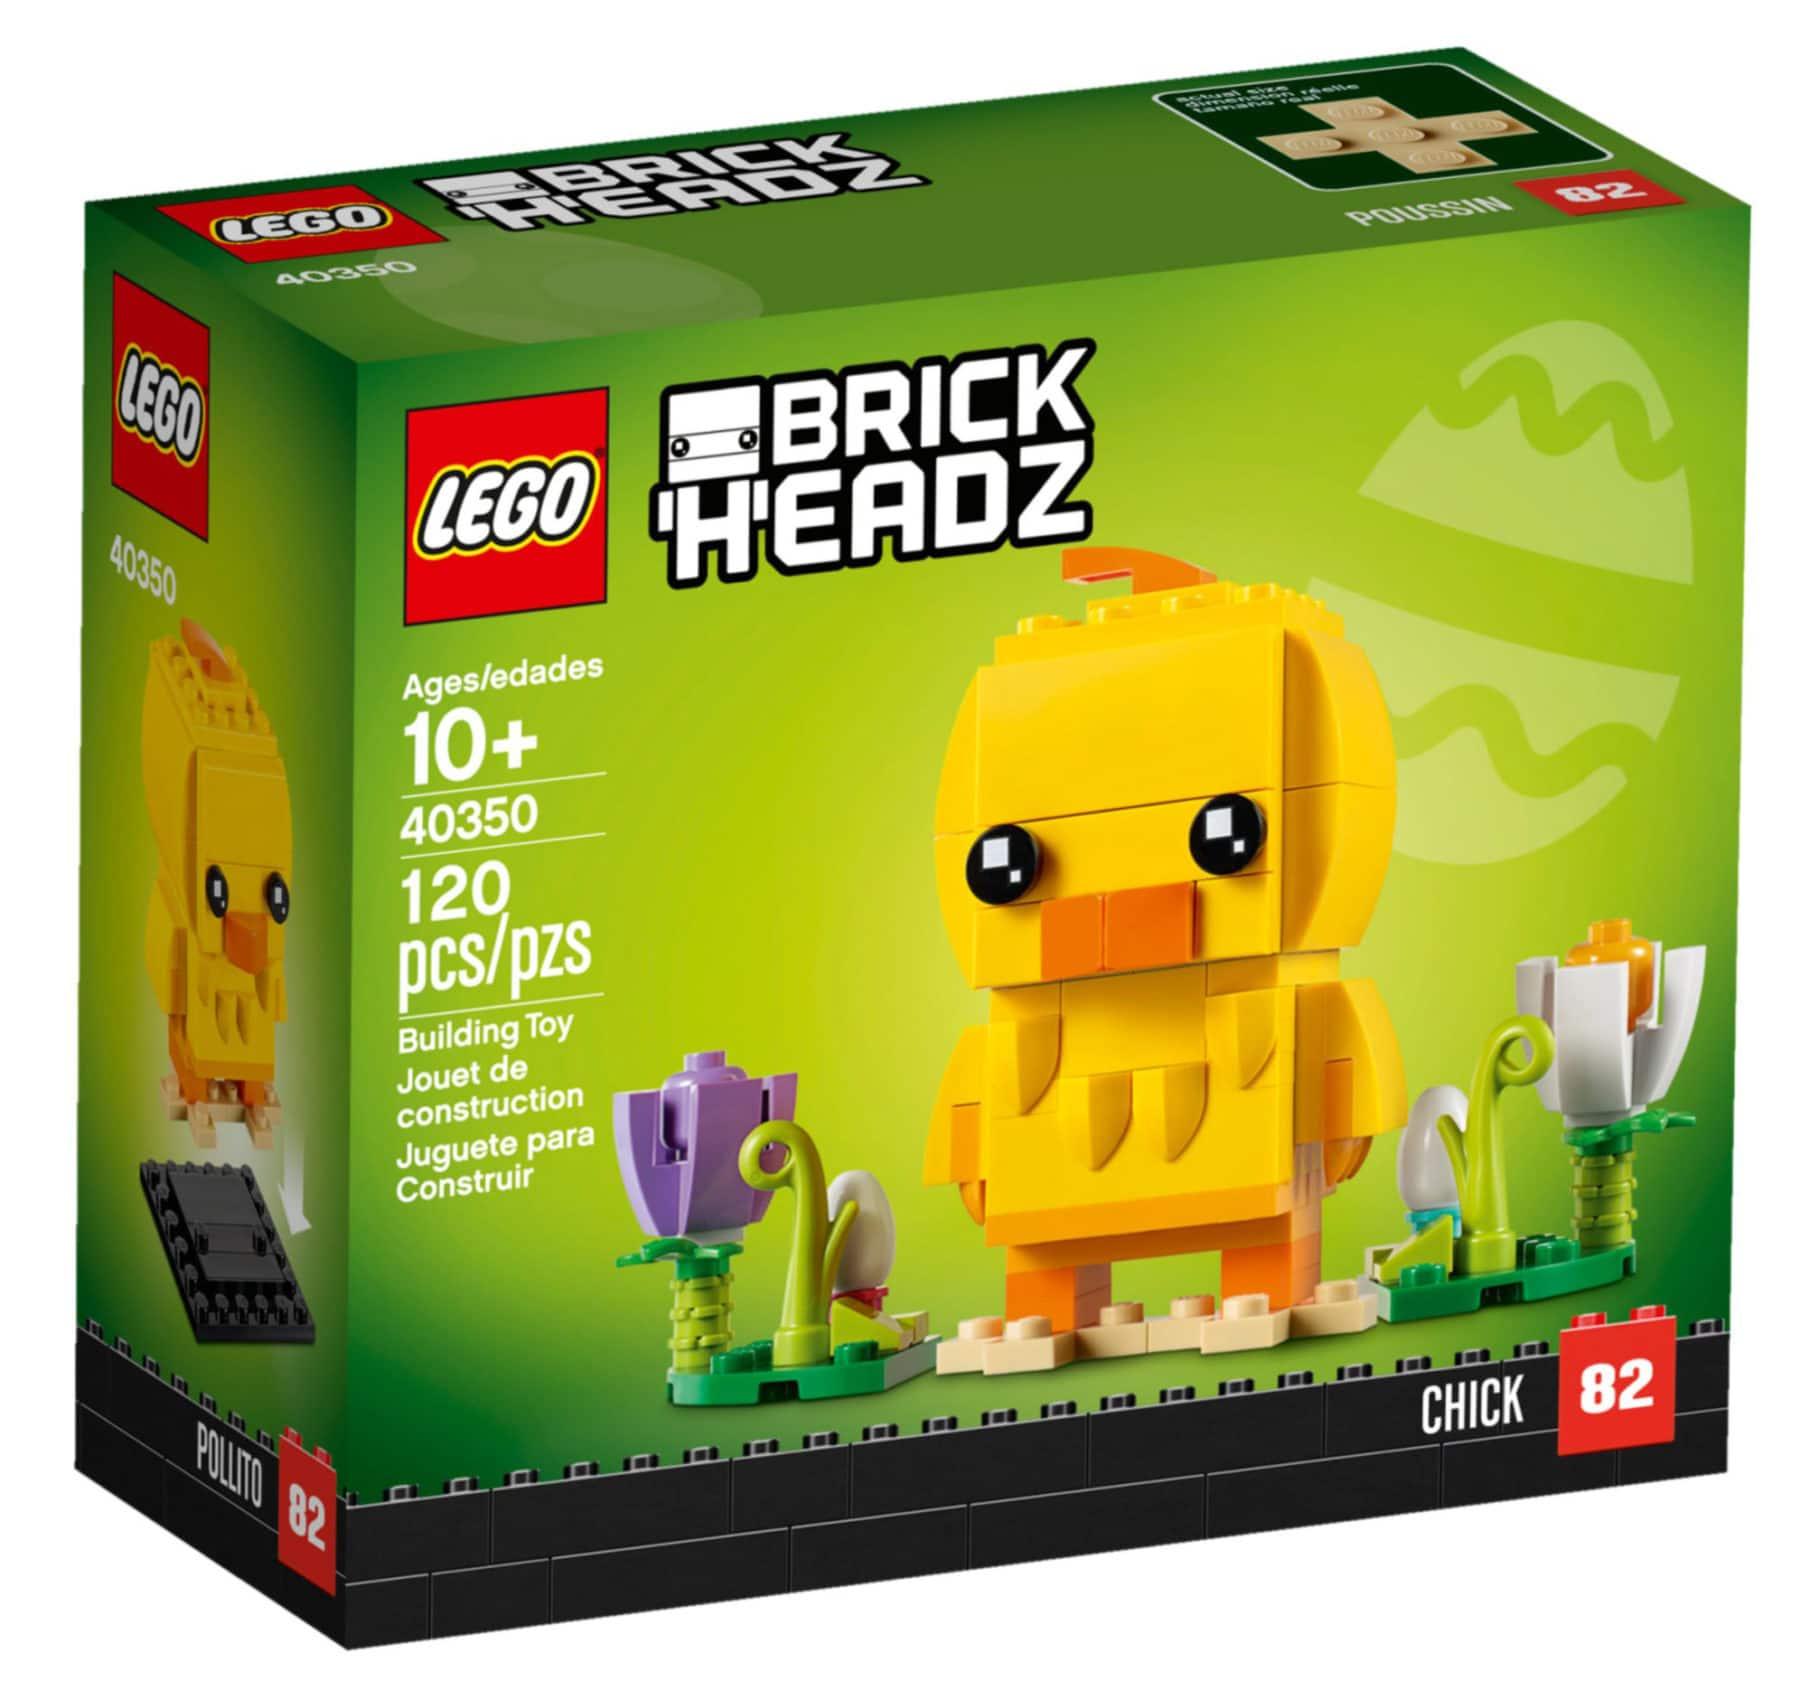 LEGO BrickHeadz 40350